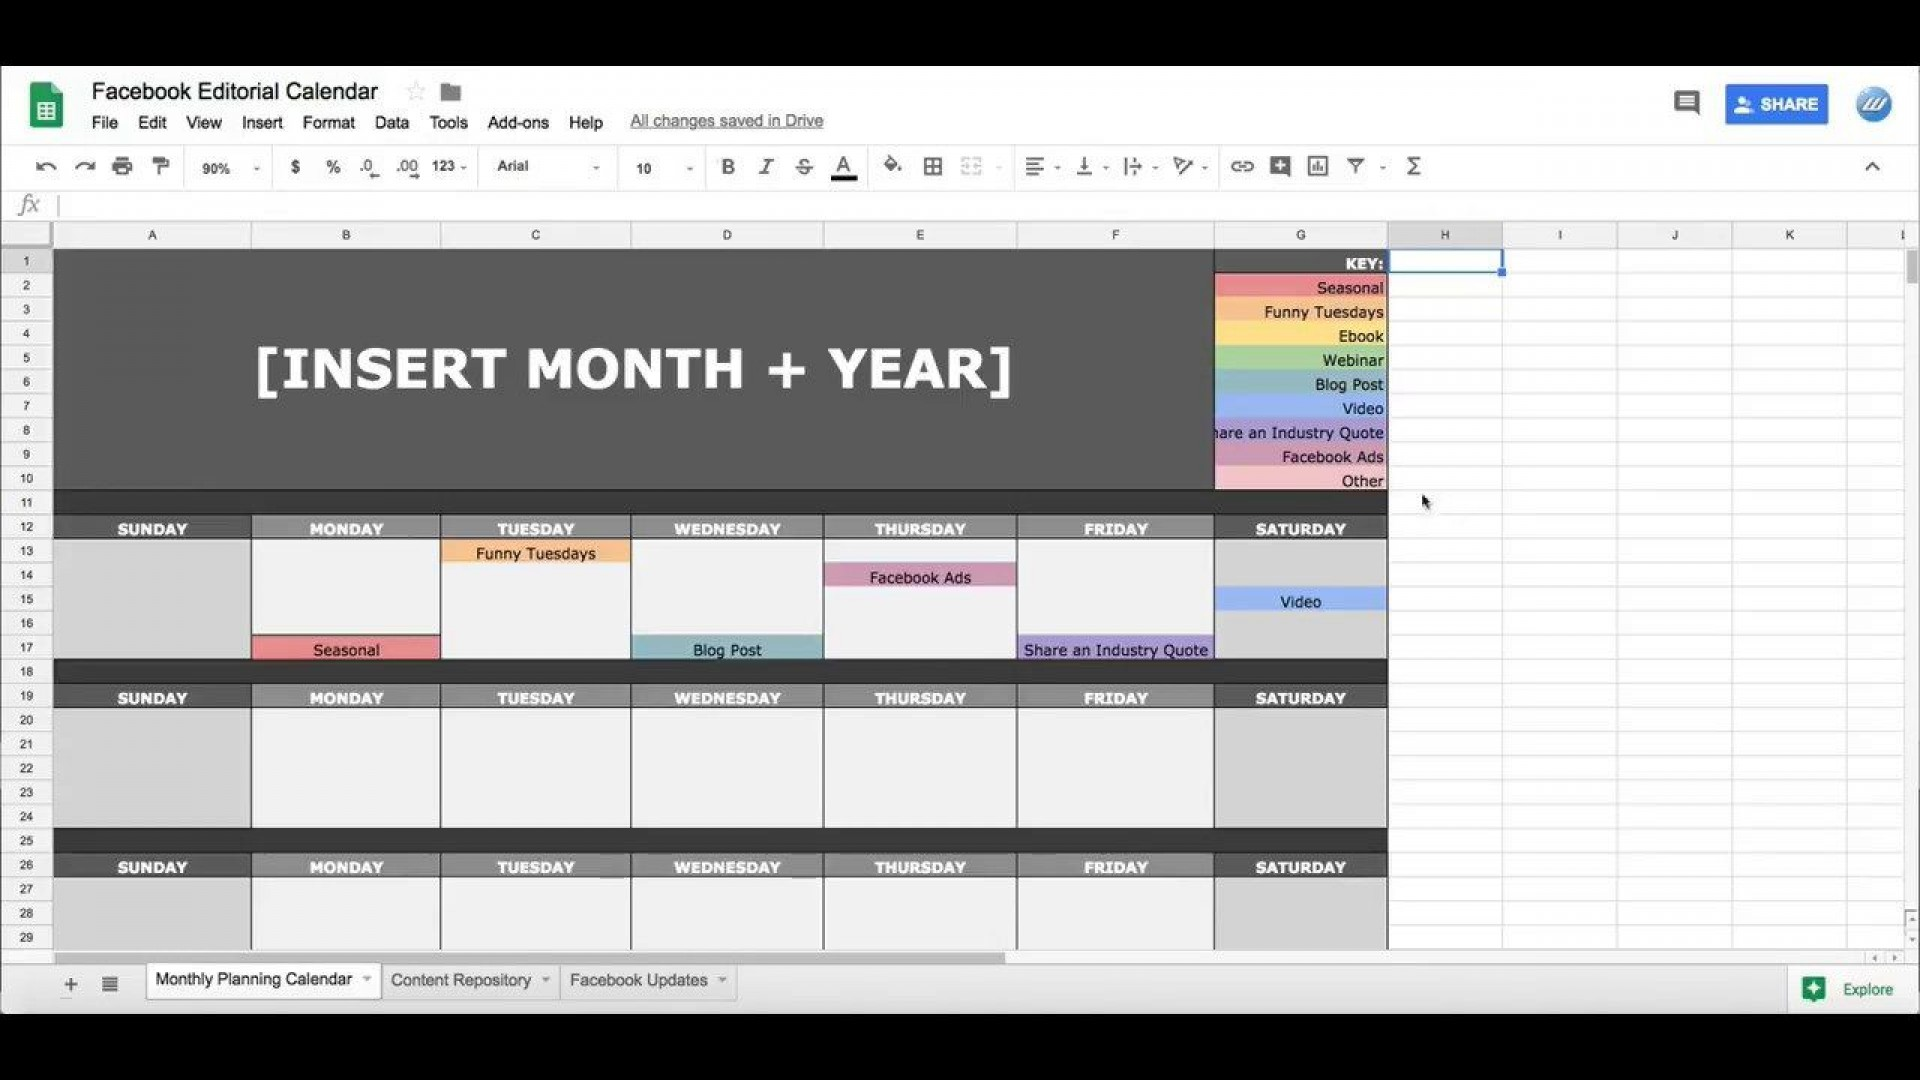 000 Formidable Social Media Editorial Calendar Template Idea  Templates Content 2019 Planning 20201920